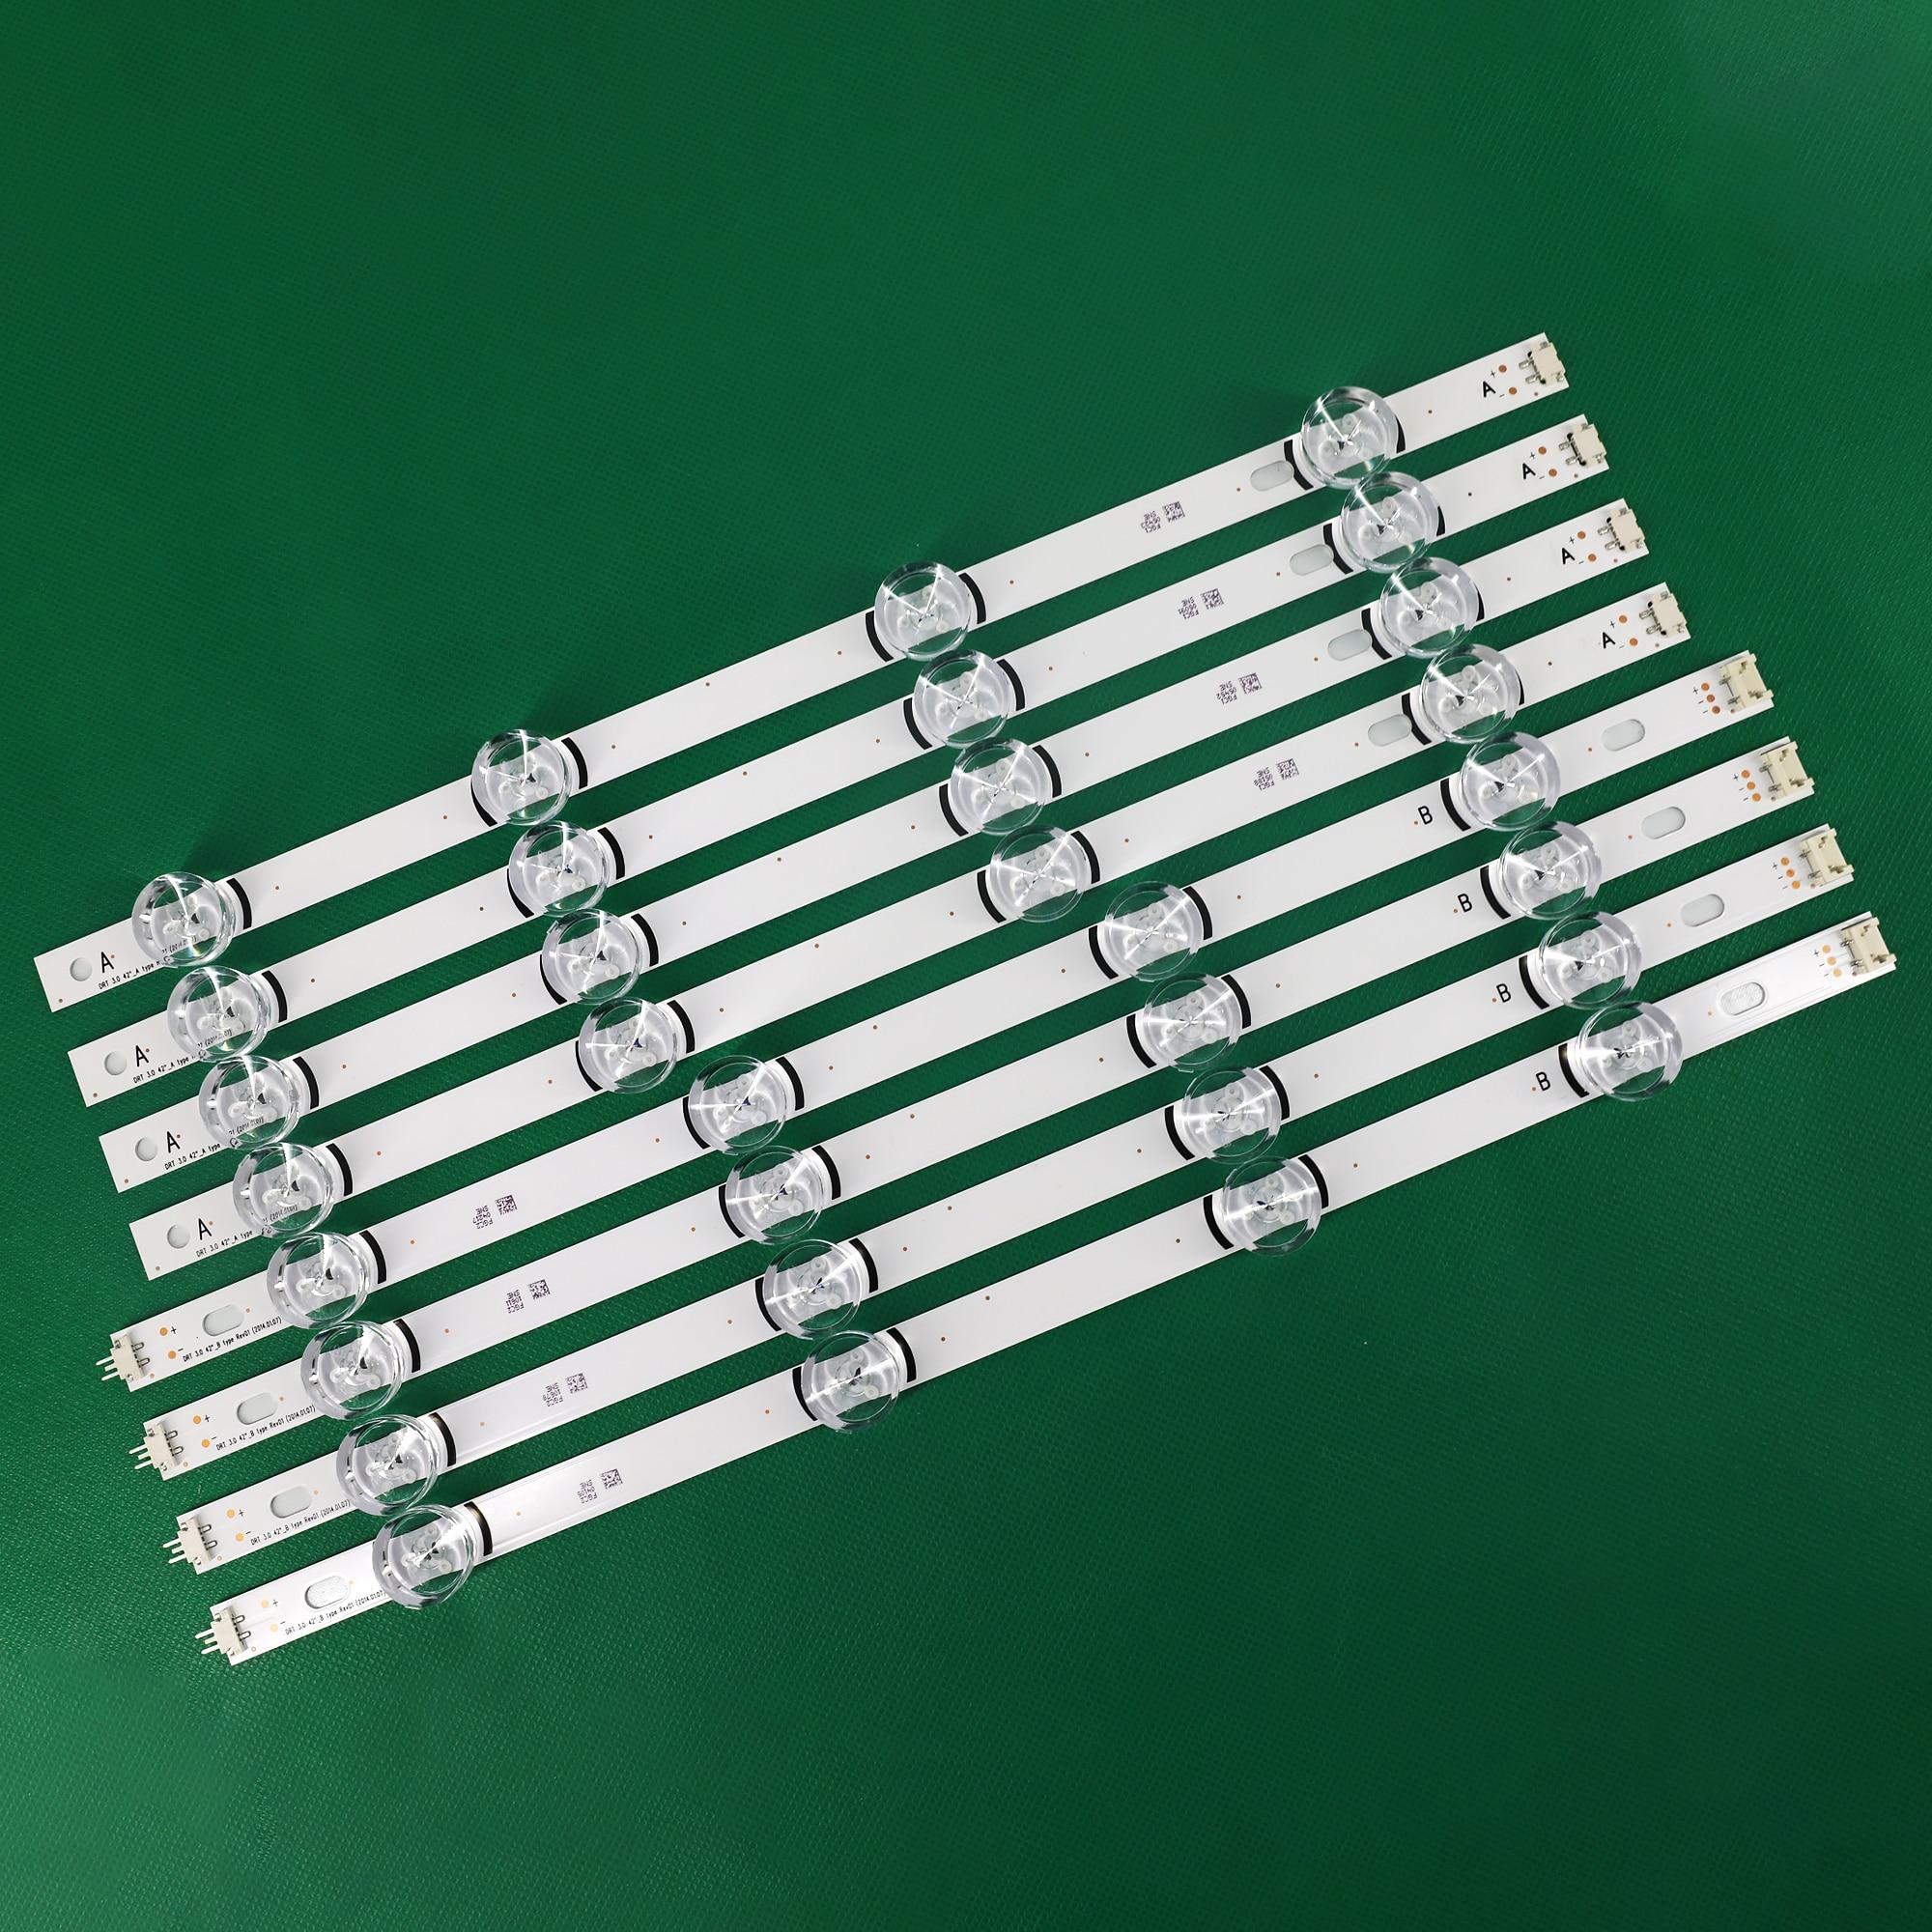 100% جديد 8 قطعة (4 * ، 4 * B) LED شرائط ل LG INNOTEK DRT 3.0 42